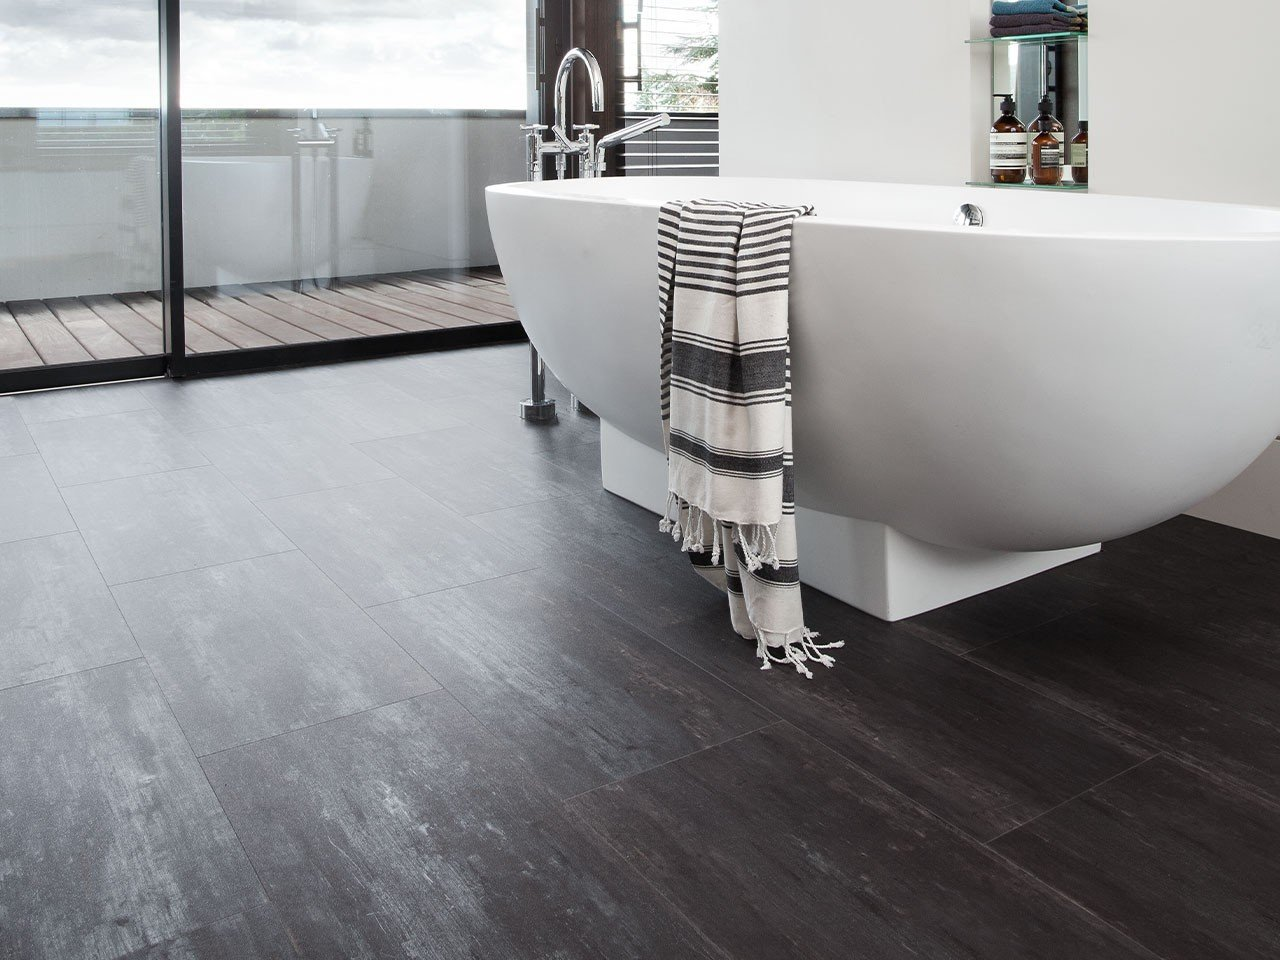 Iperceramica soluzioni di arredo bagno pavimenti e rivestimenti